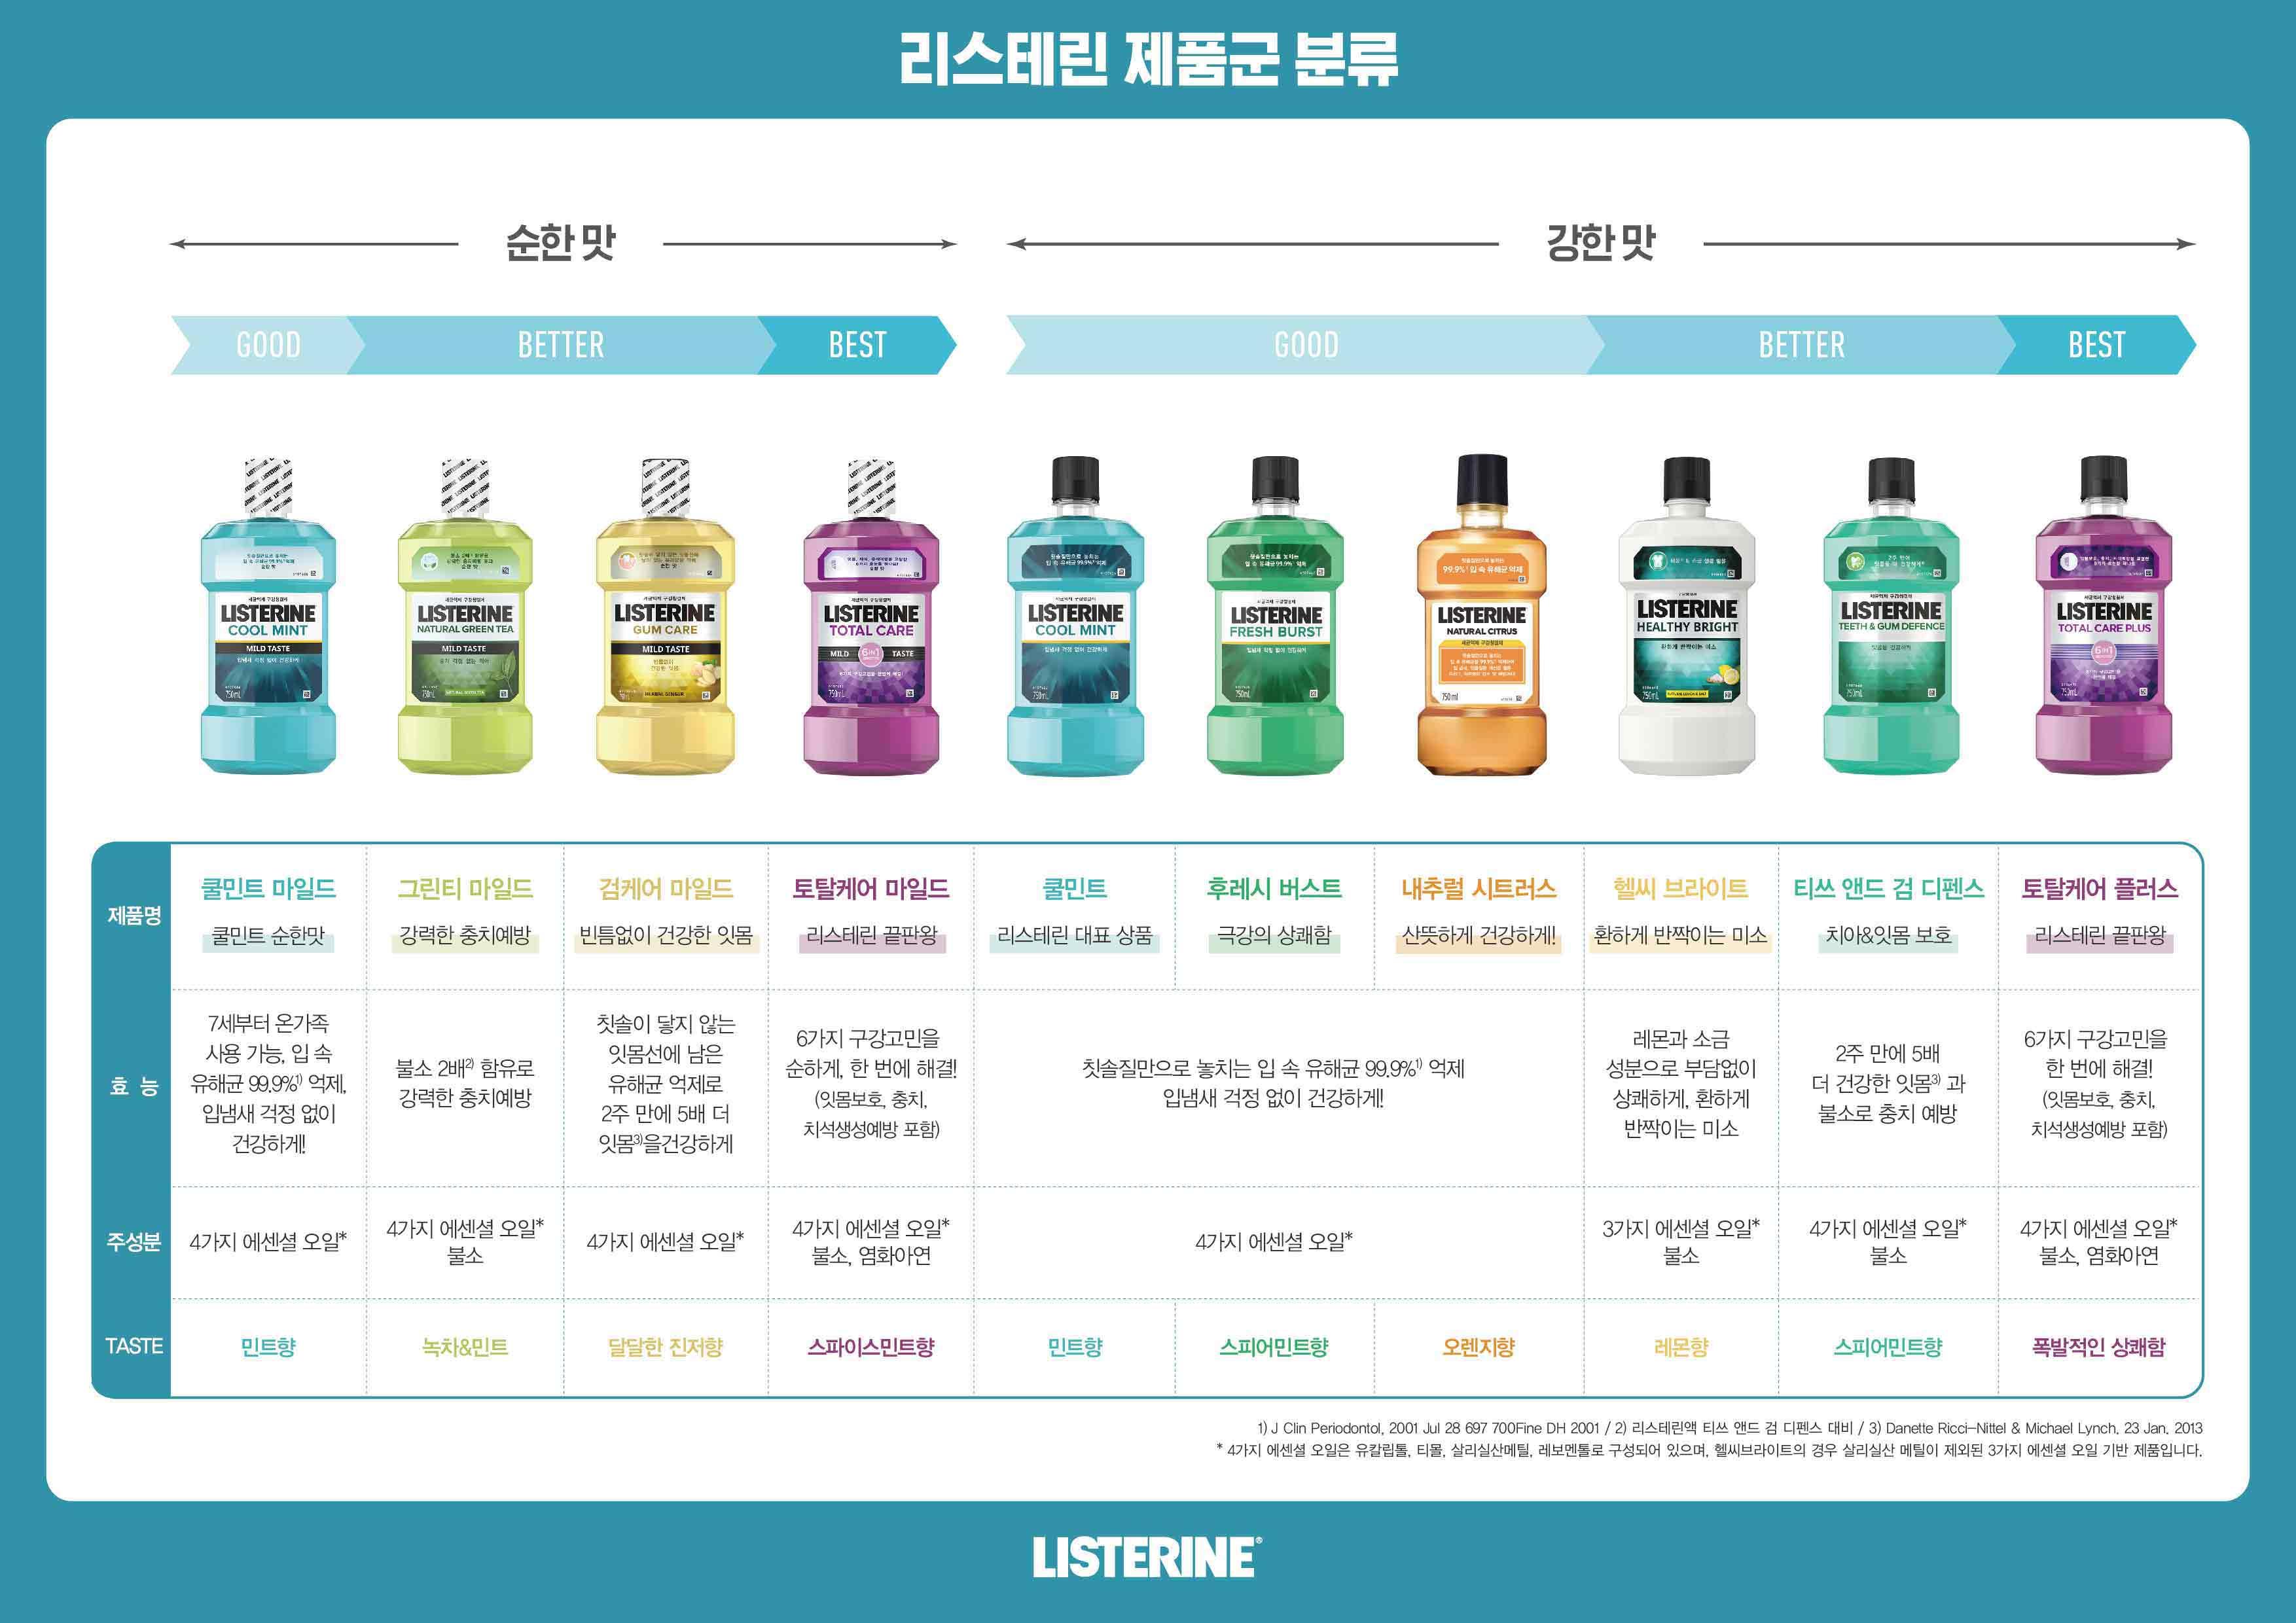 listerine-product-chart.jpg